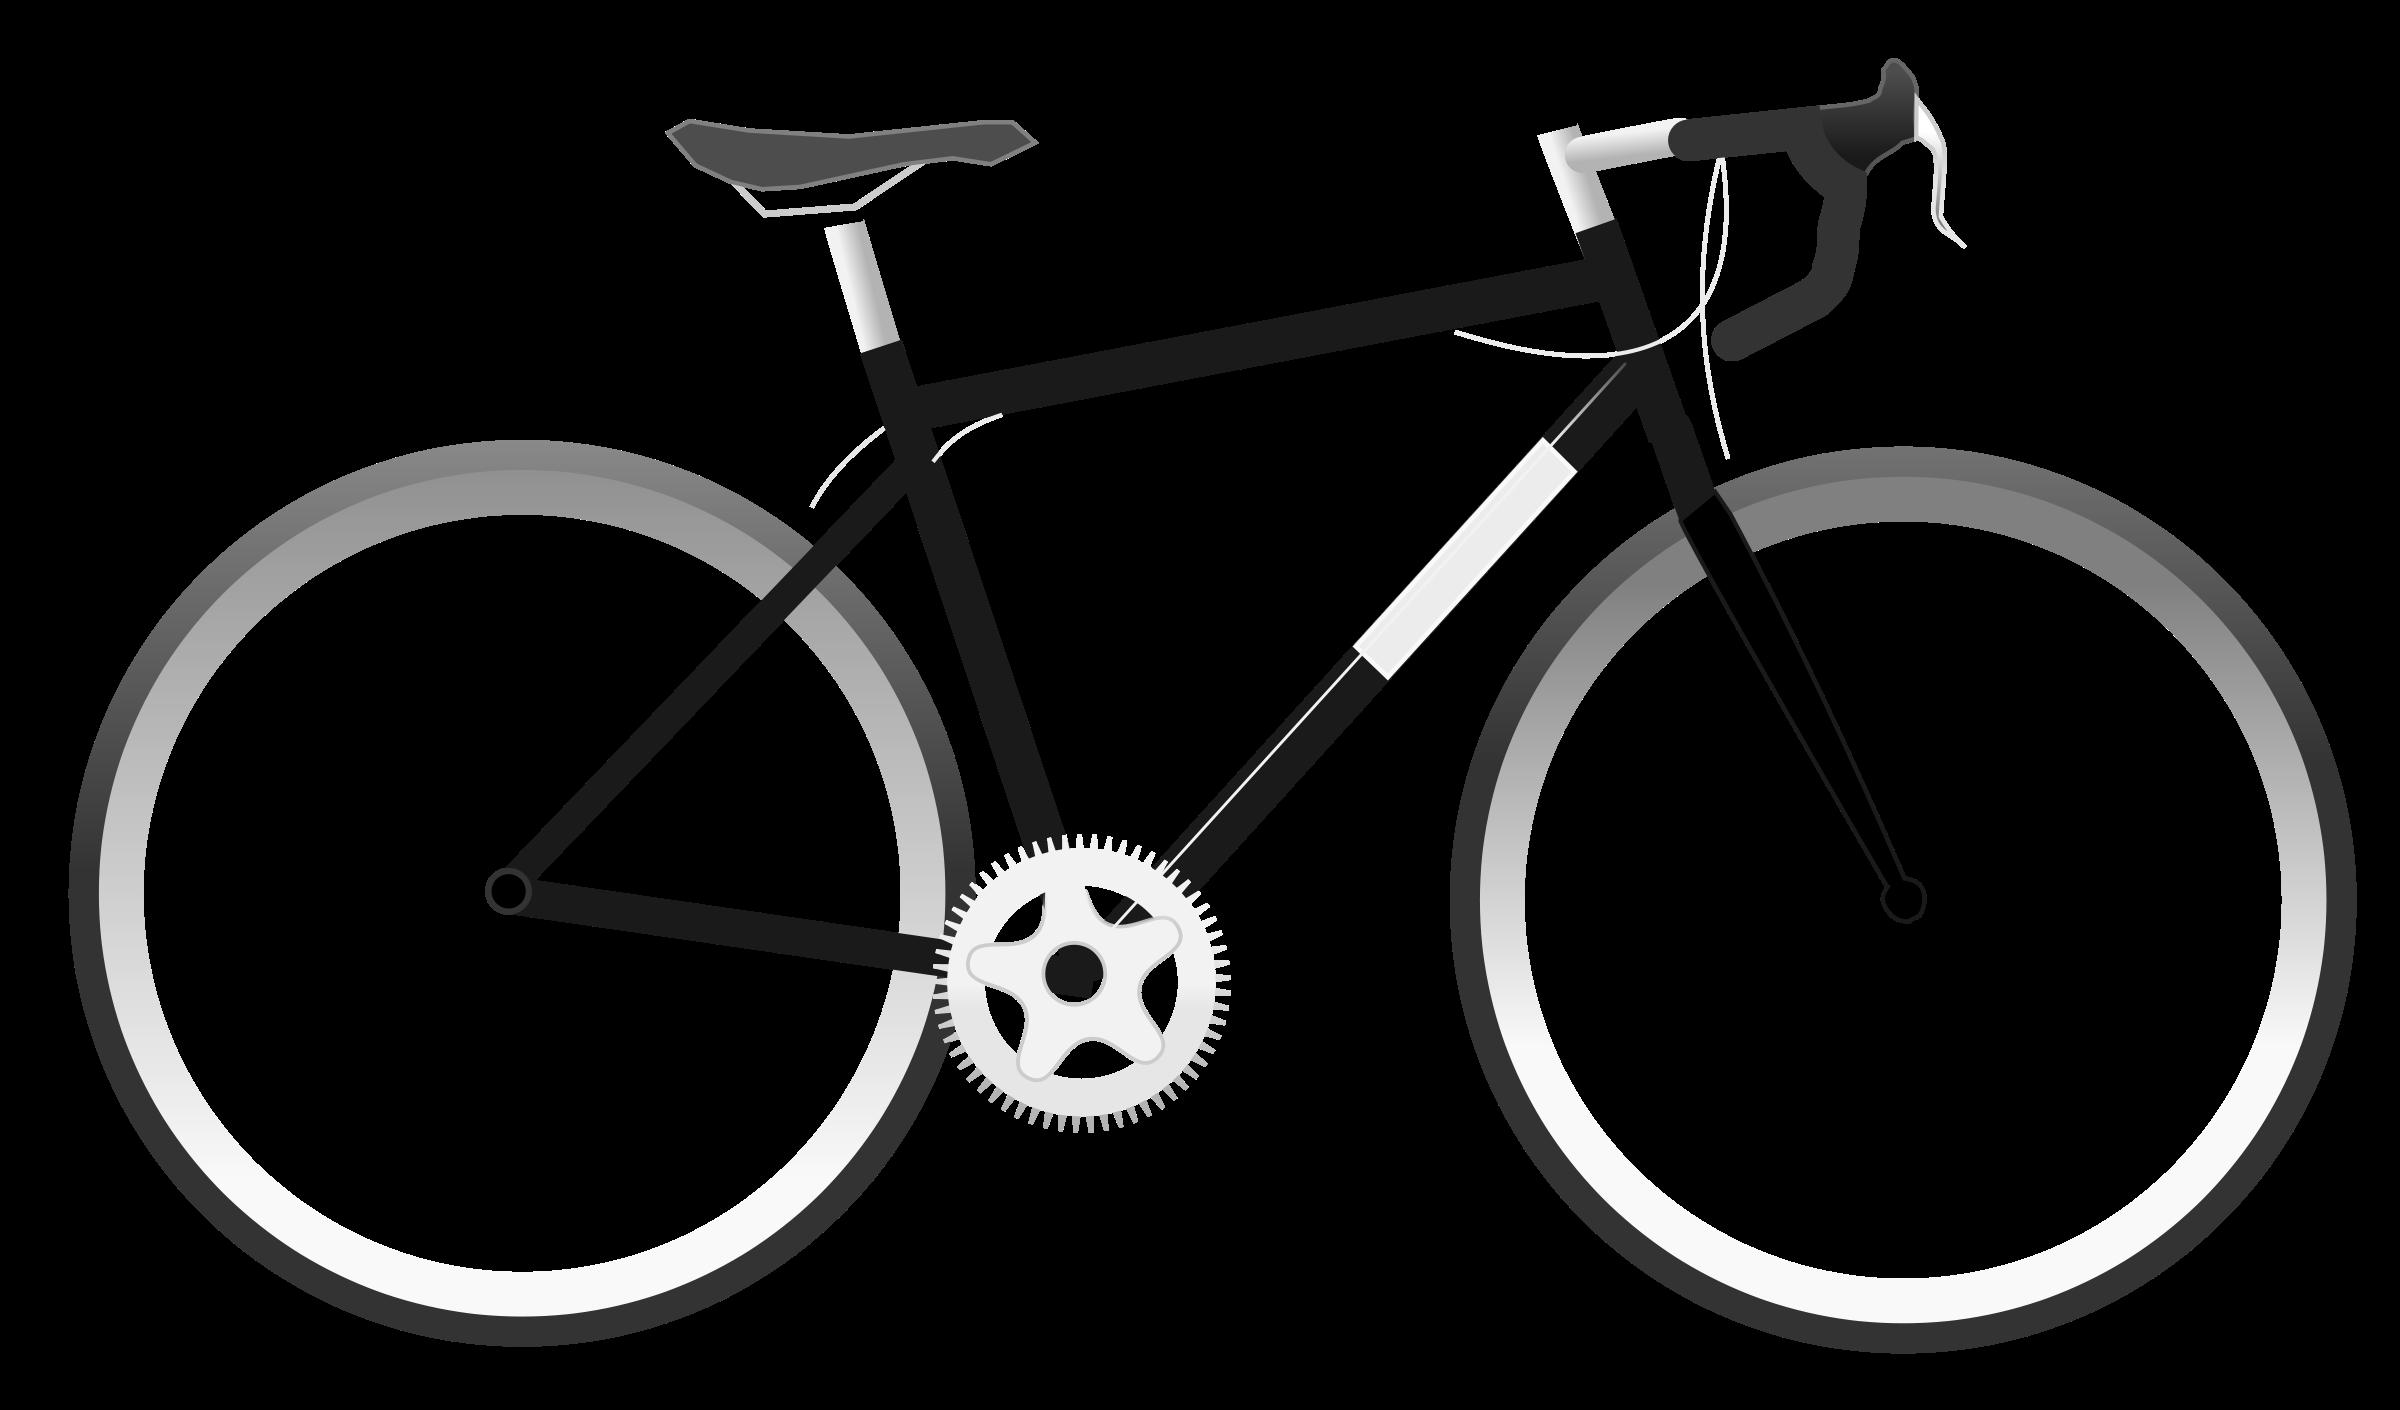 Bike Clipart Black And White | Free download best Bike Clipart ... for Bicycle Clipart Black And White  103wja